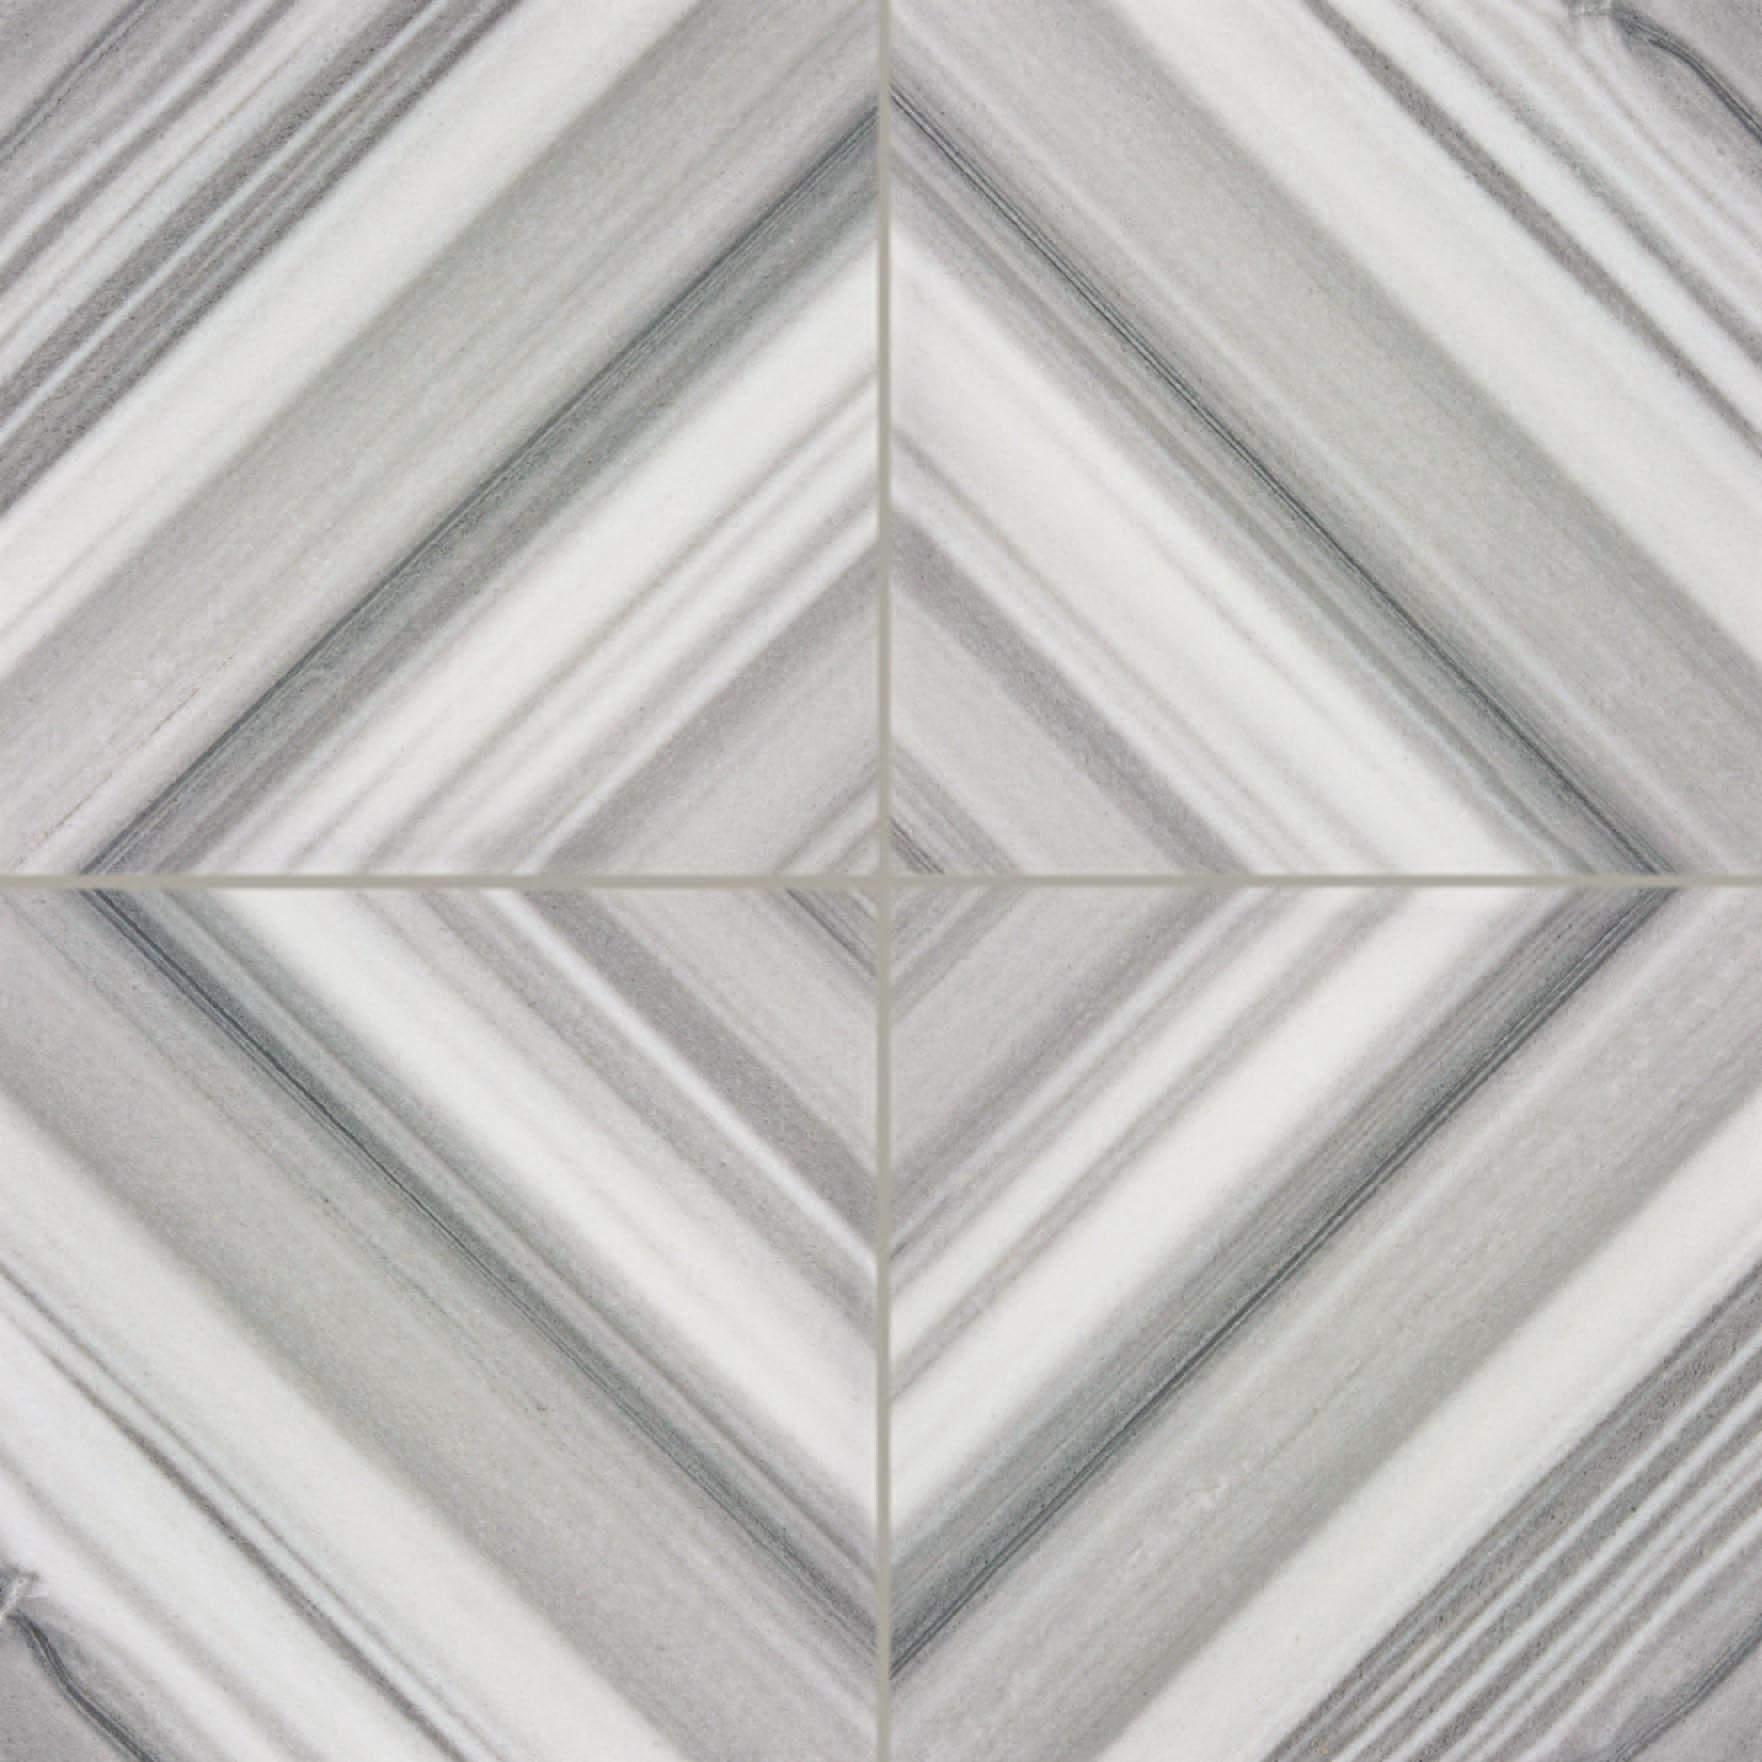 Marmara Diagonal Field Tile By Artistic Natural Stone Tiles